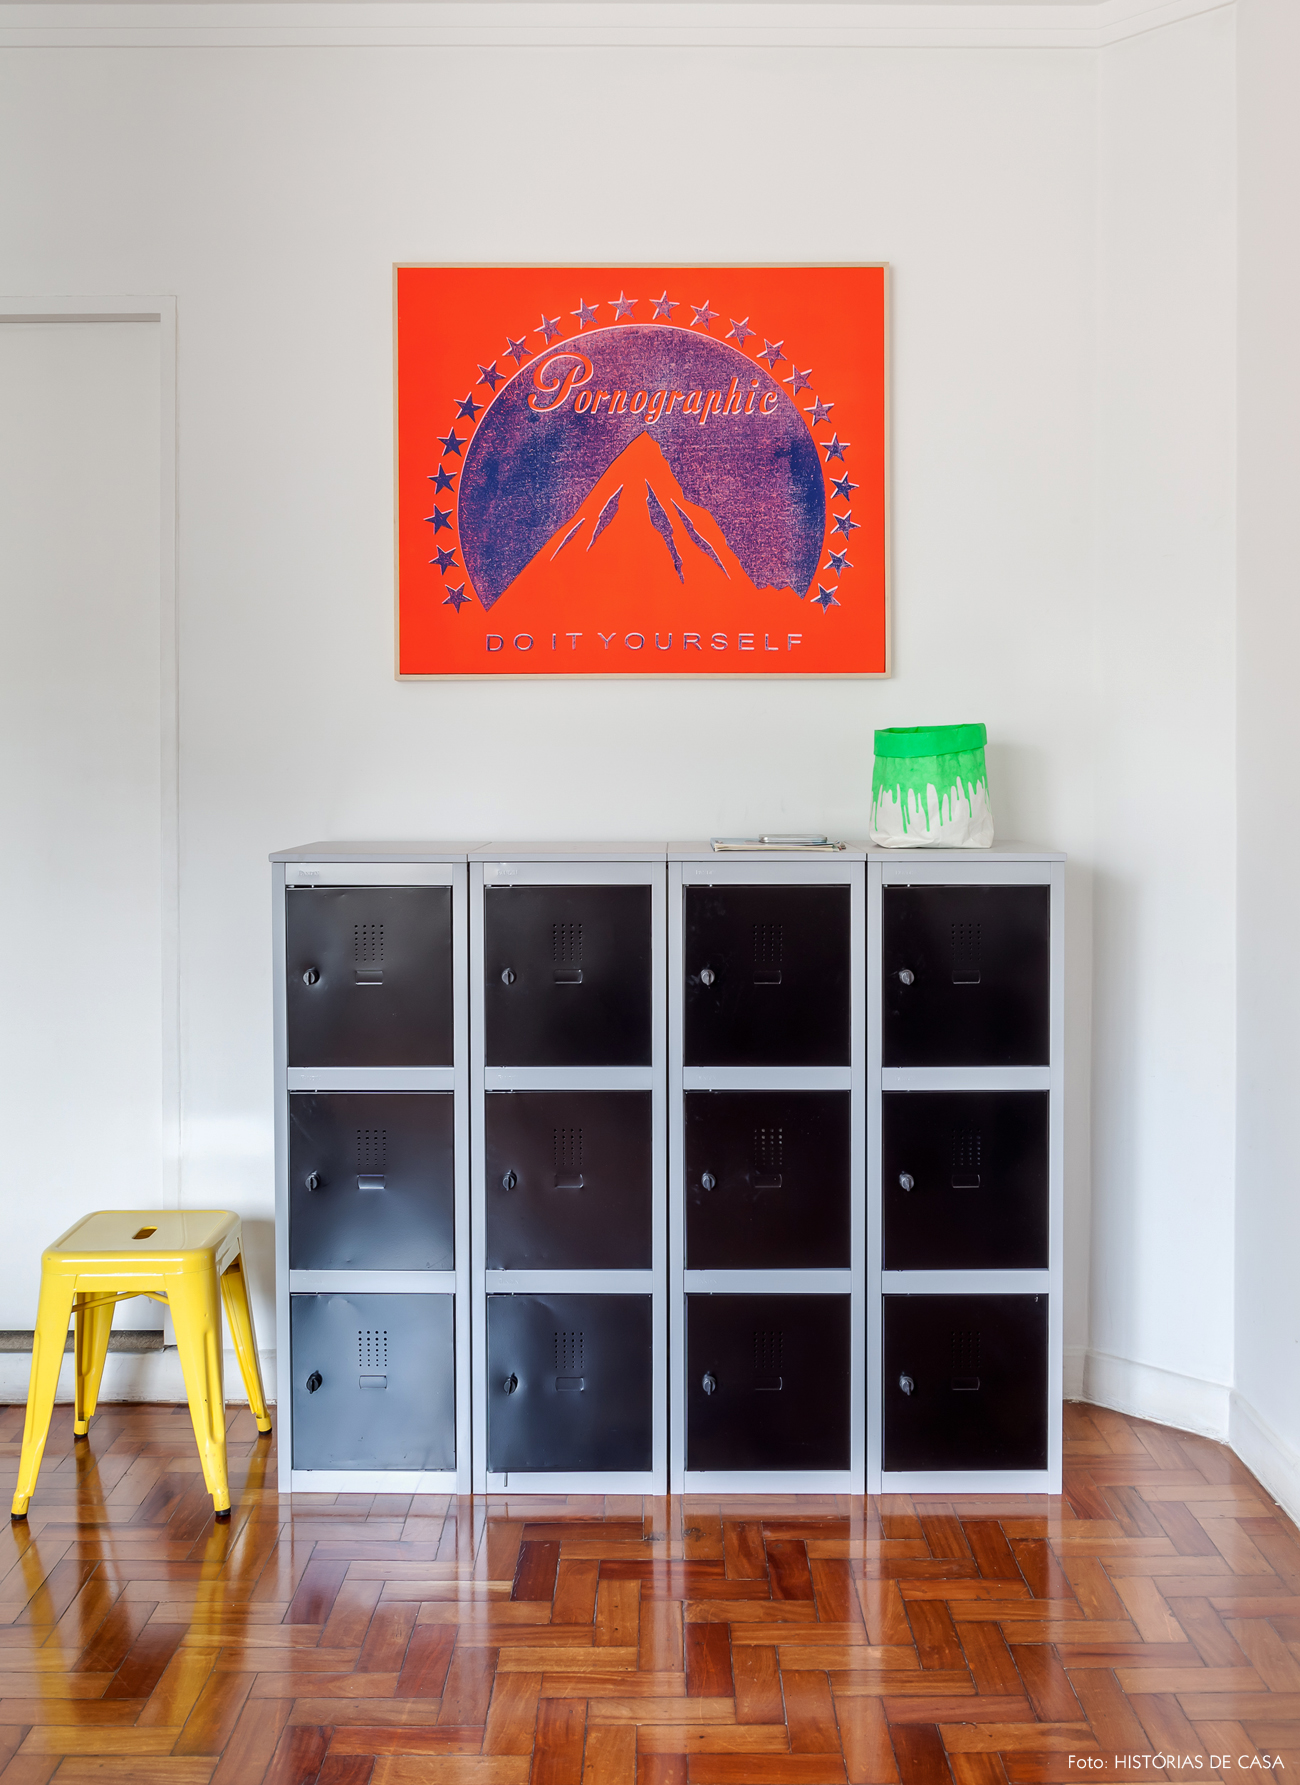 29-decoracao-estilo-industrial-quarto-cores-fluorescentes-neon